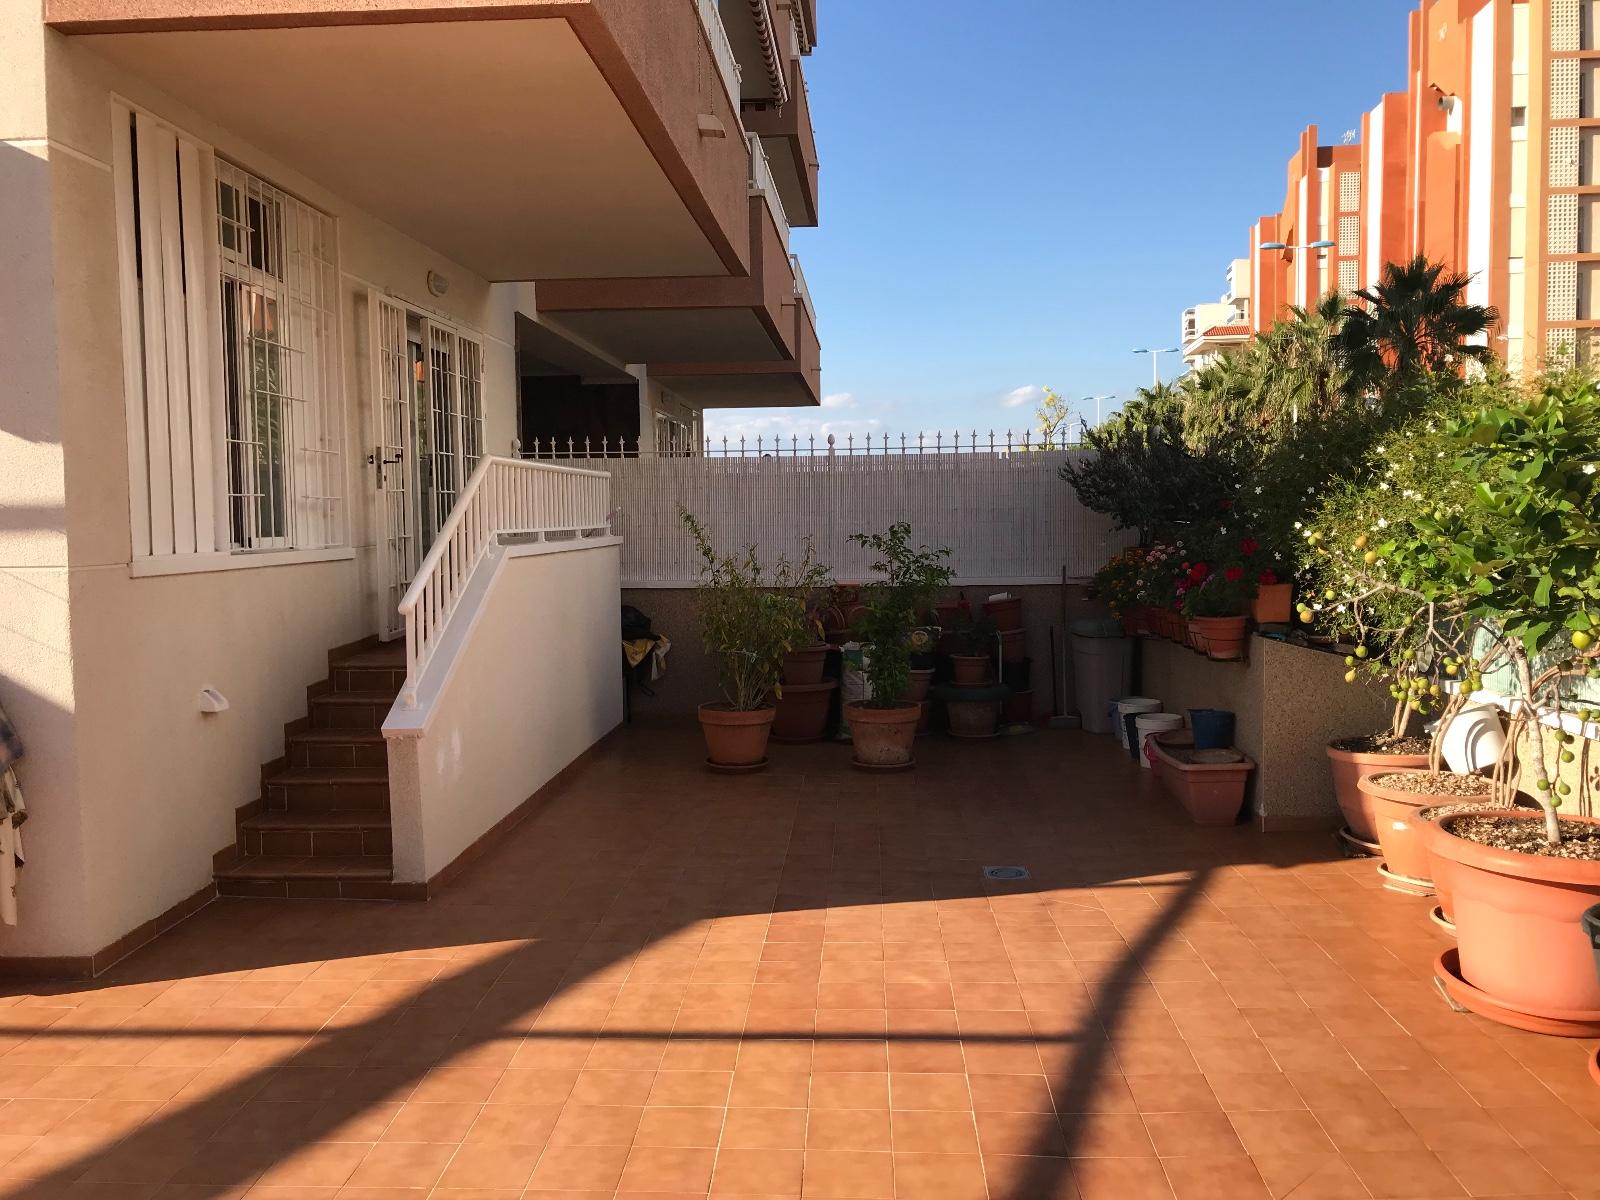 3 bedroom apartment / flat for sale in Guardamar del Segura, Costa Blanca